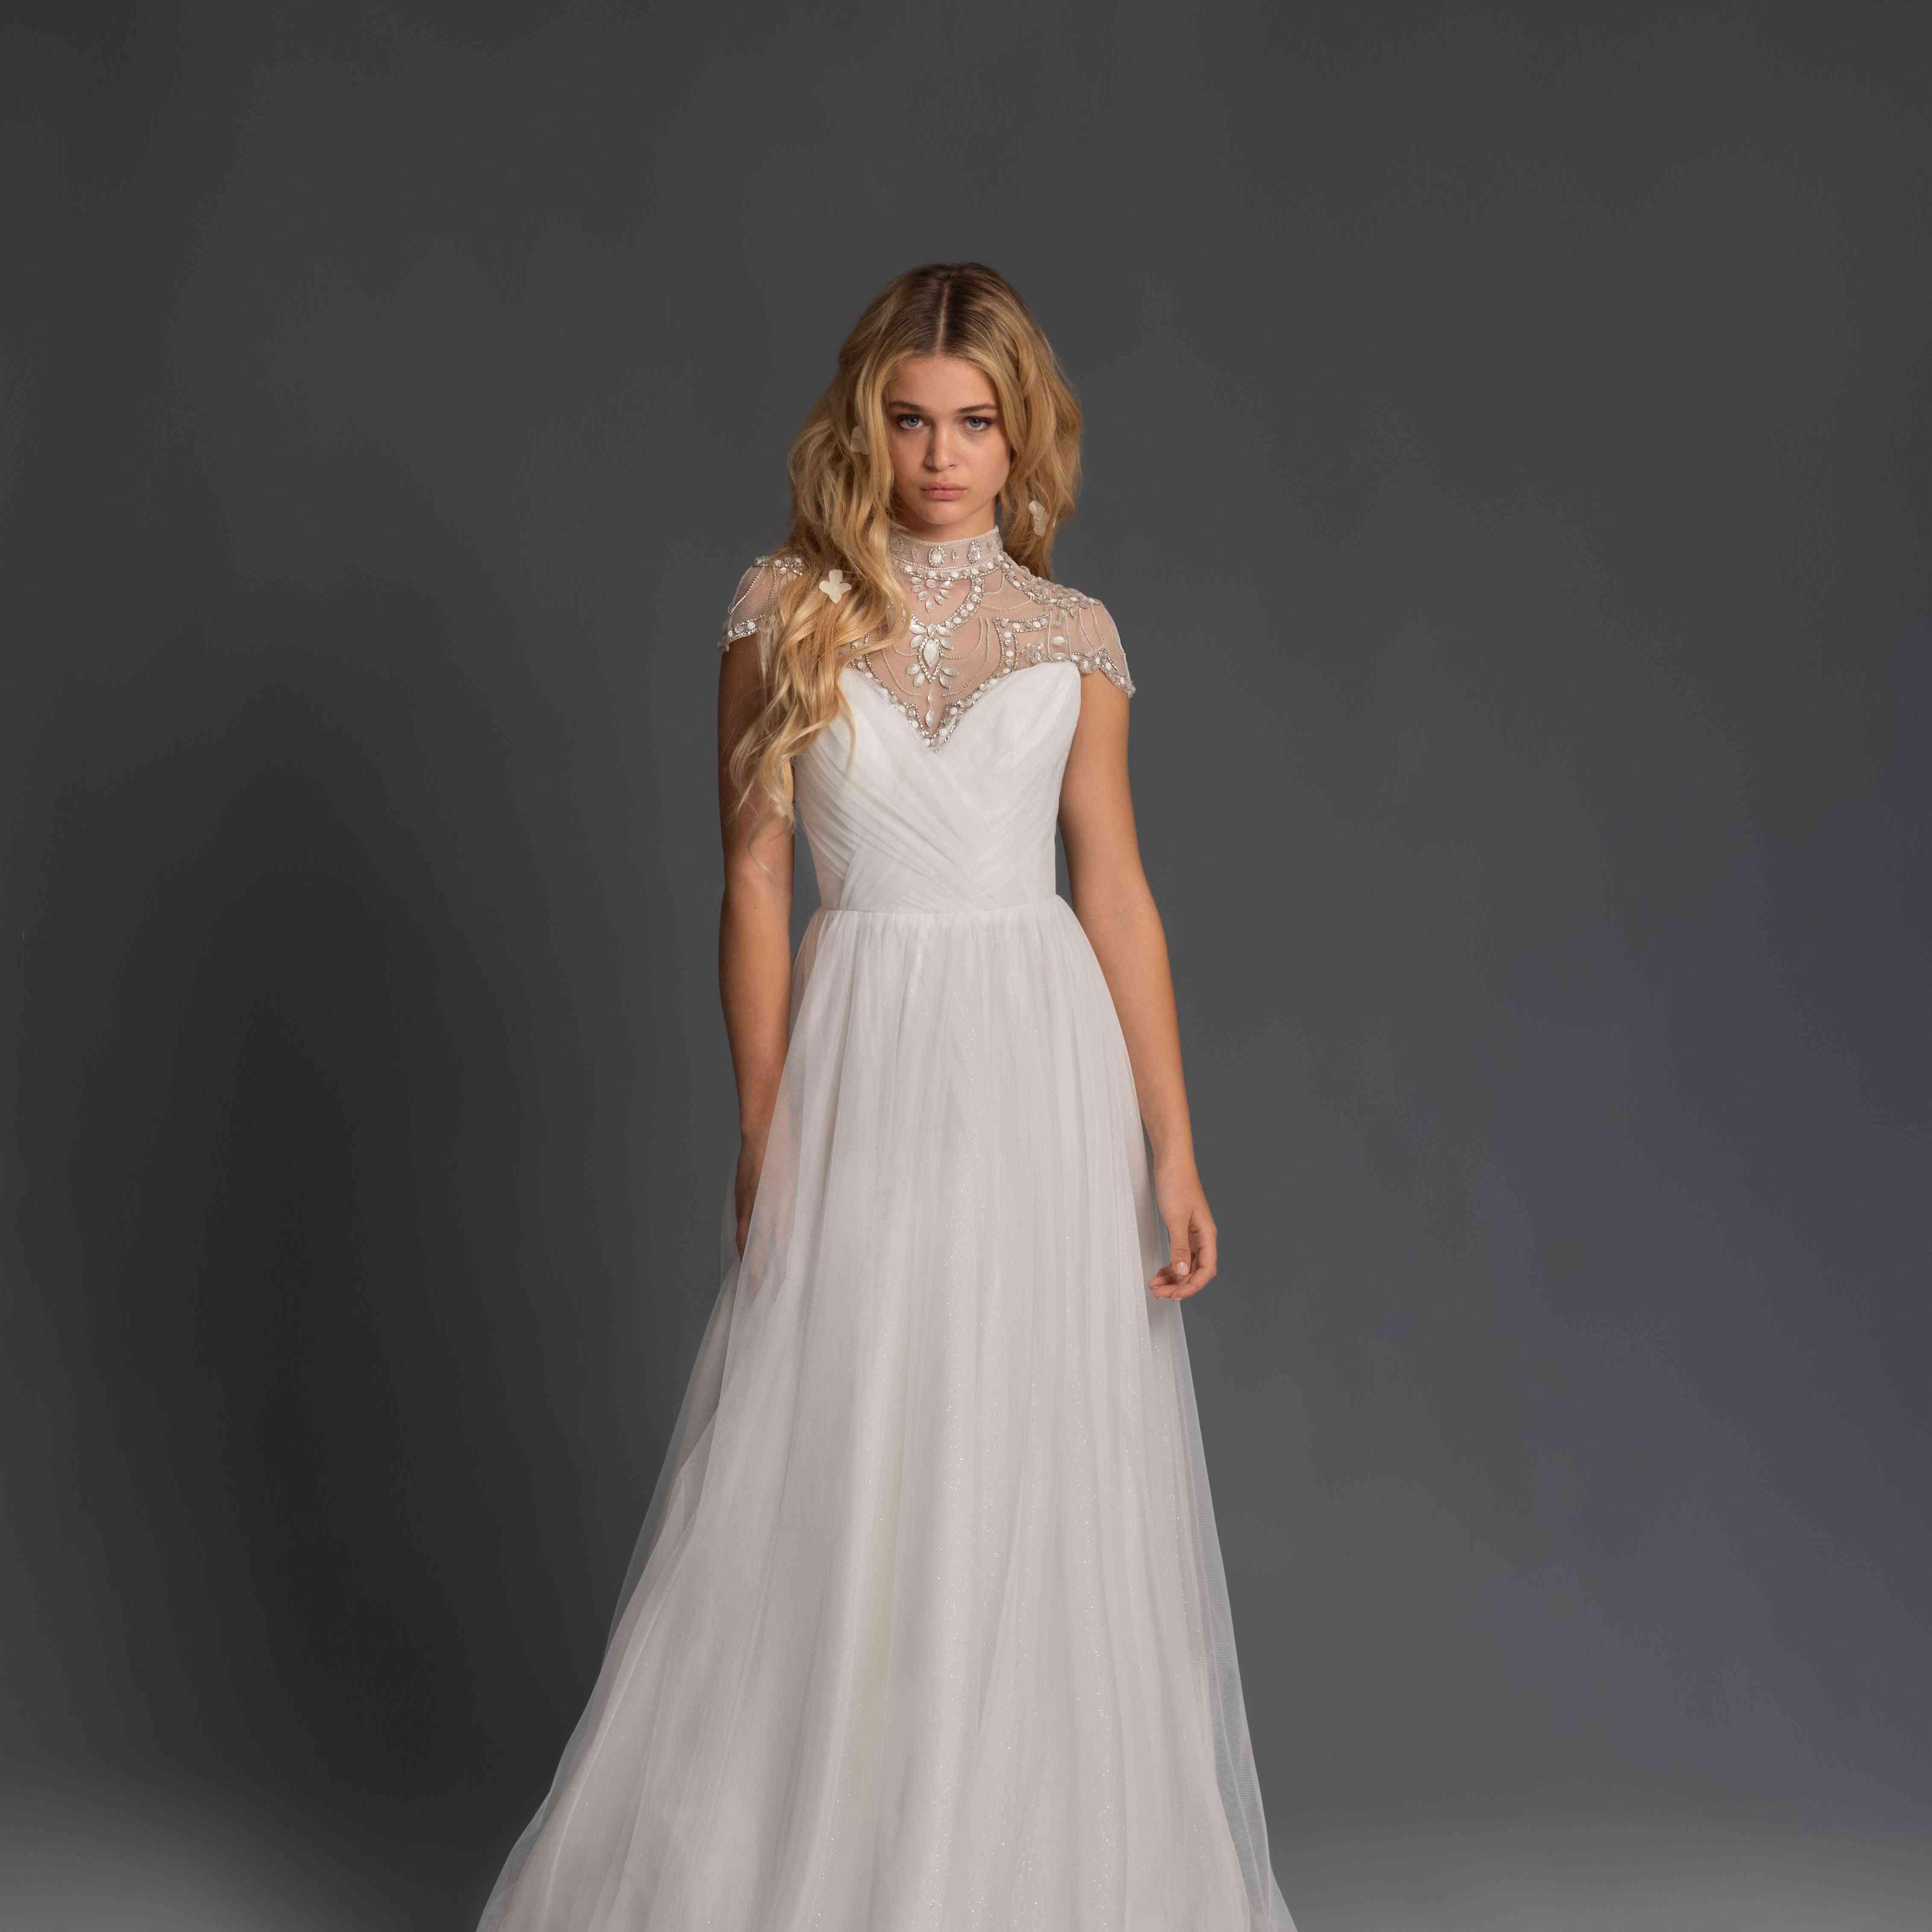 Model in high neck short sleeve wedding dress